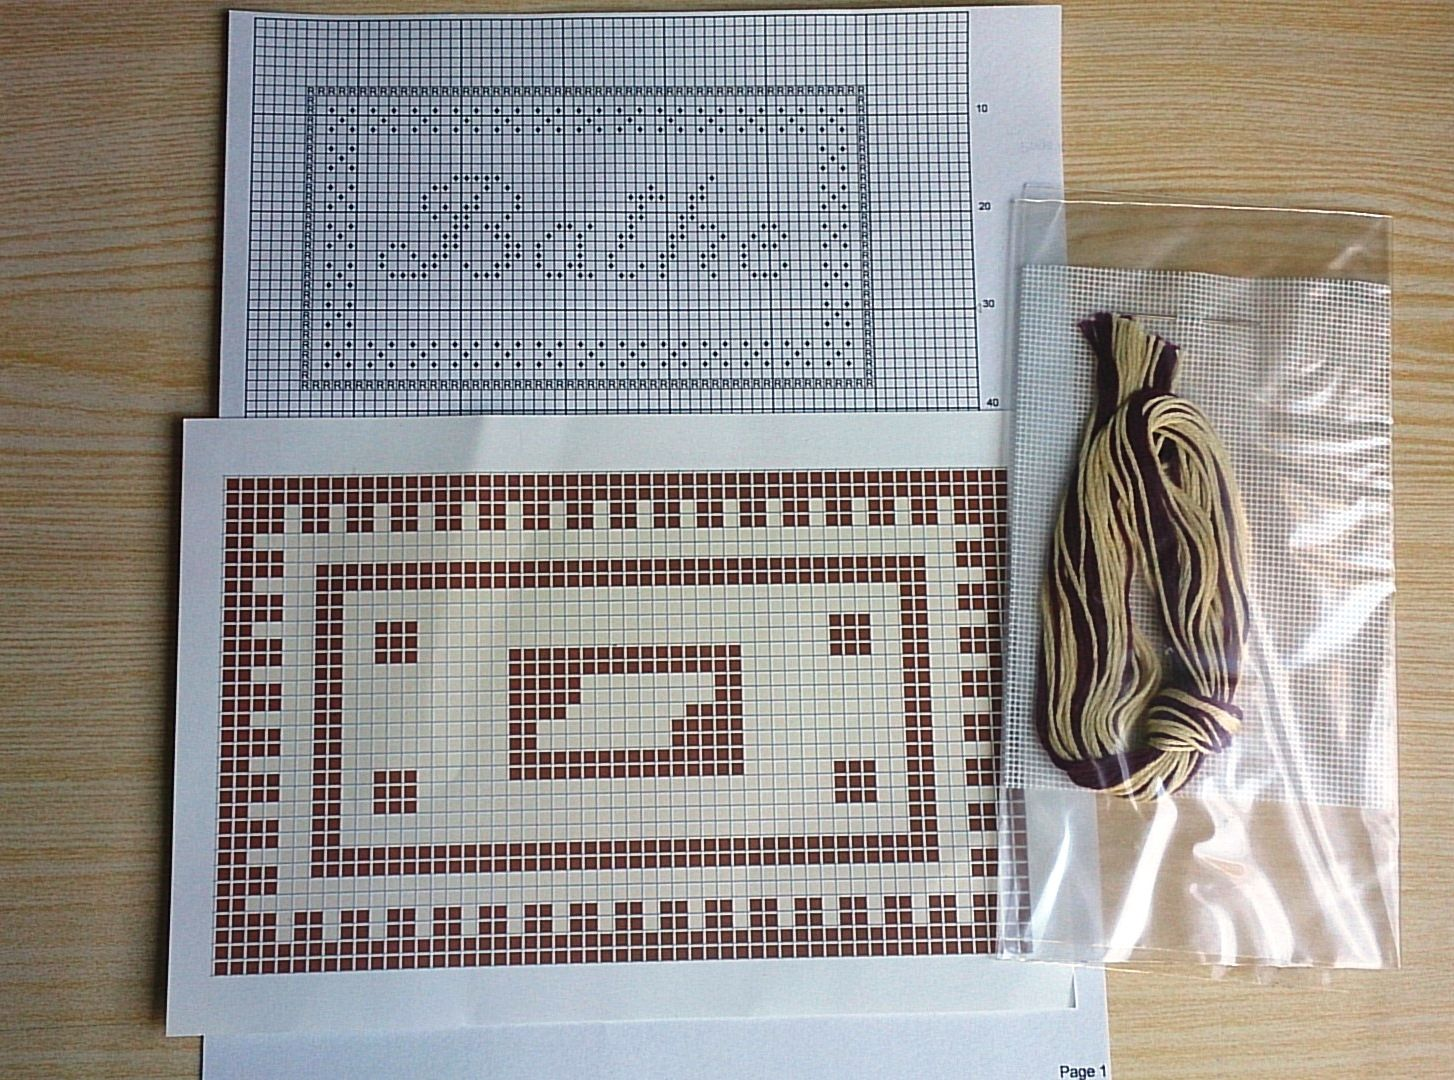 Del Prado Kit To Make Rug Boring Design Includes Canvas And Brown Cream